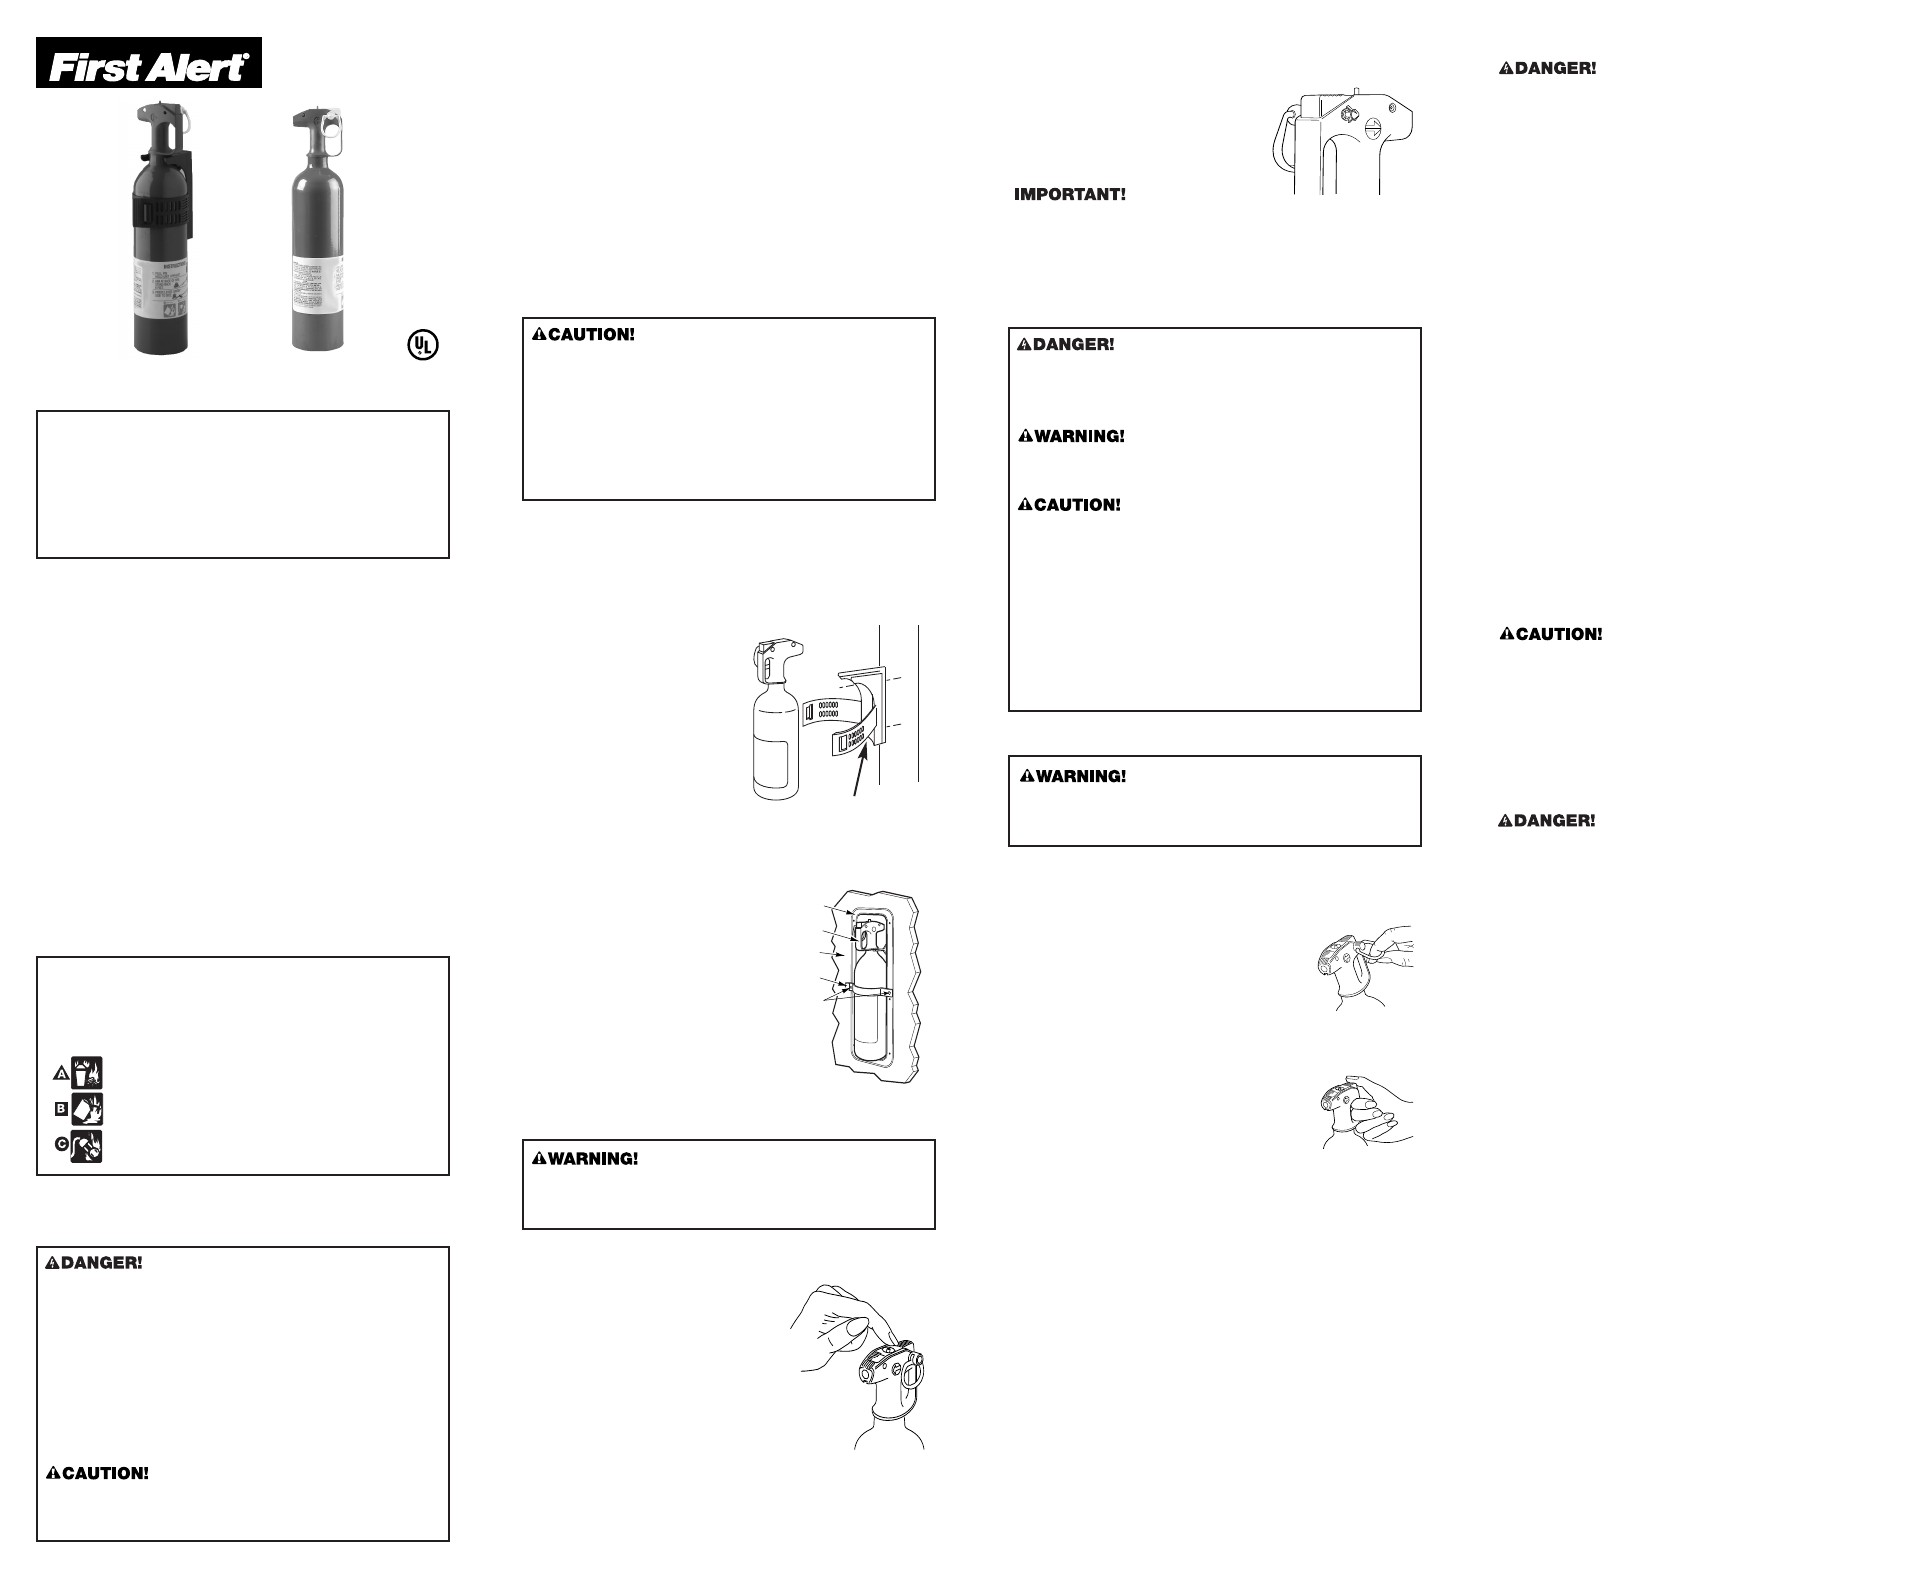 Fire Extinguisher Parts Diagram